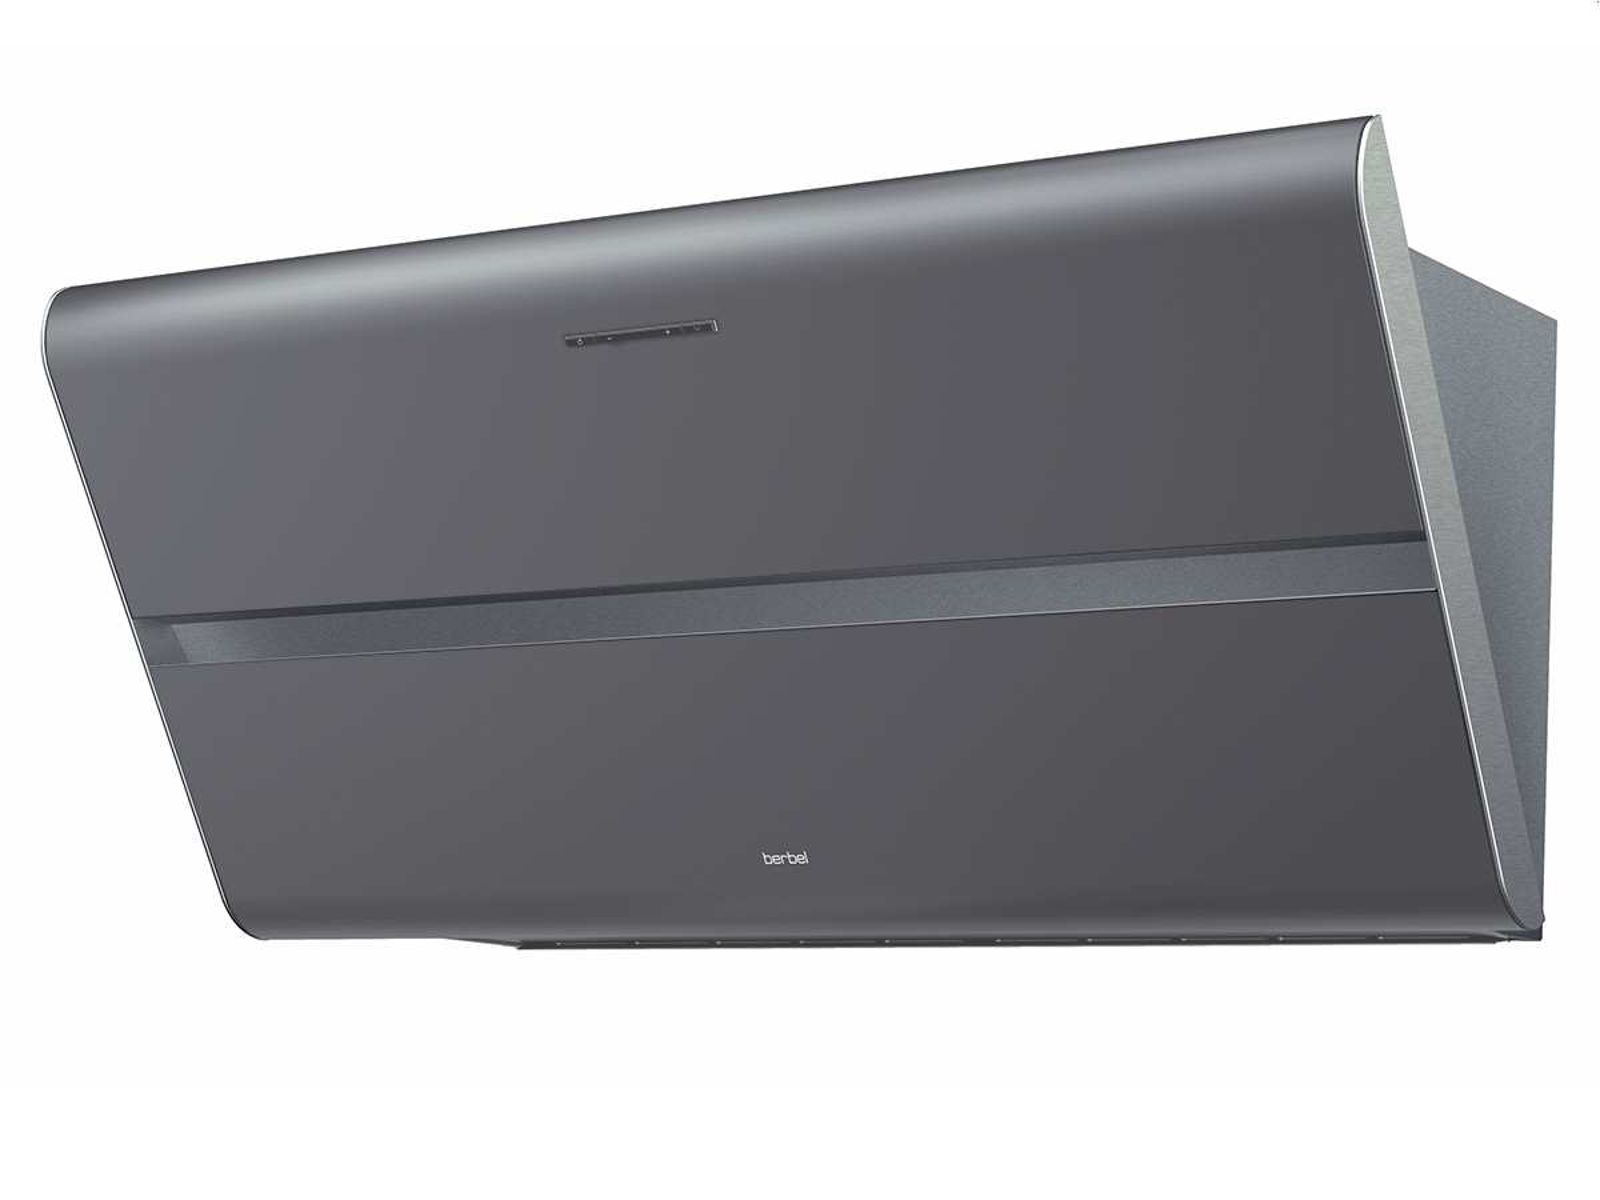 berbel smartline bkh 90 st gm u kopffreihaube grau metallic. Black Bedroom Furniture Sets. Home Design Ideas